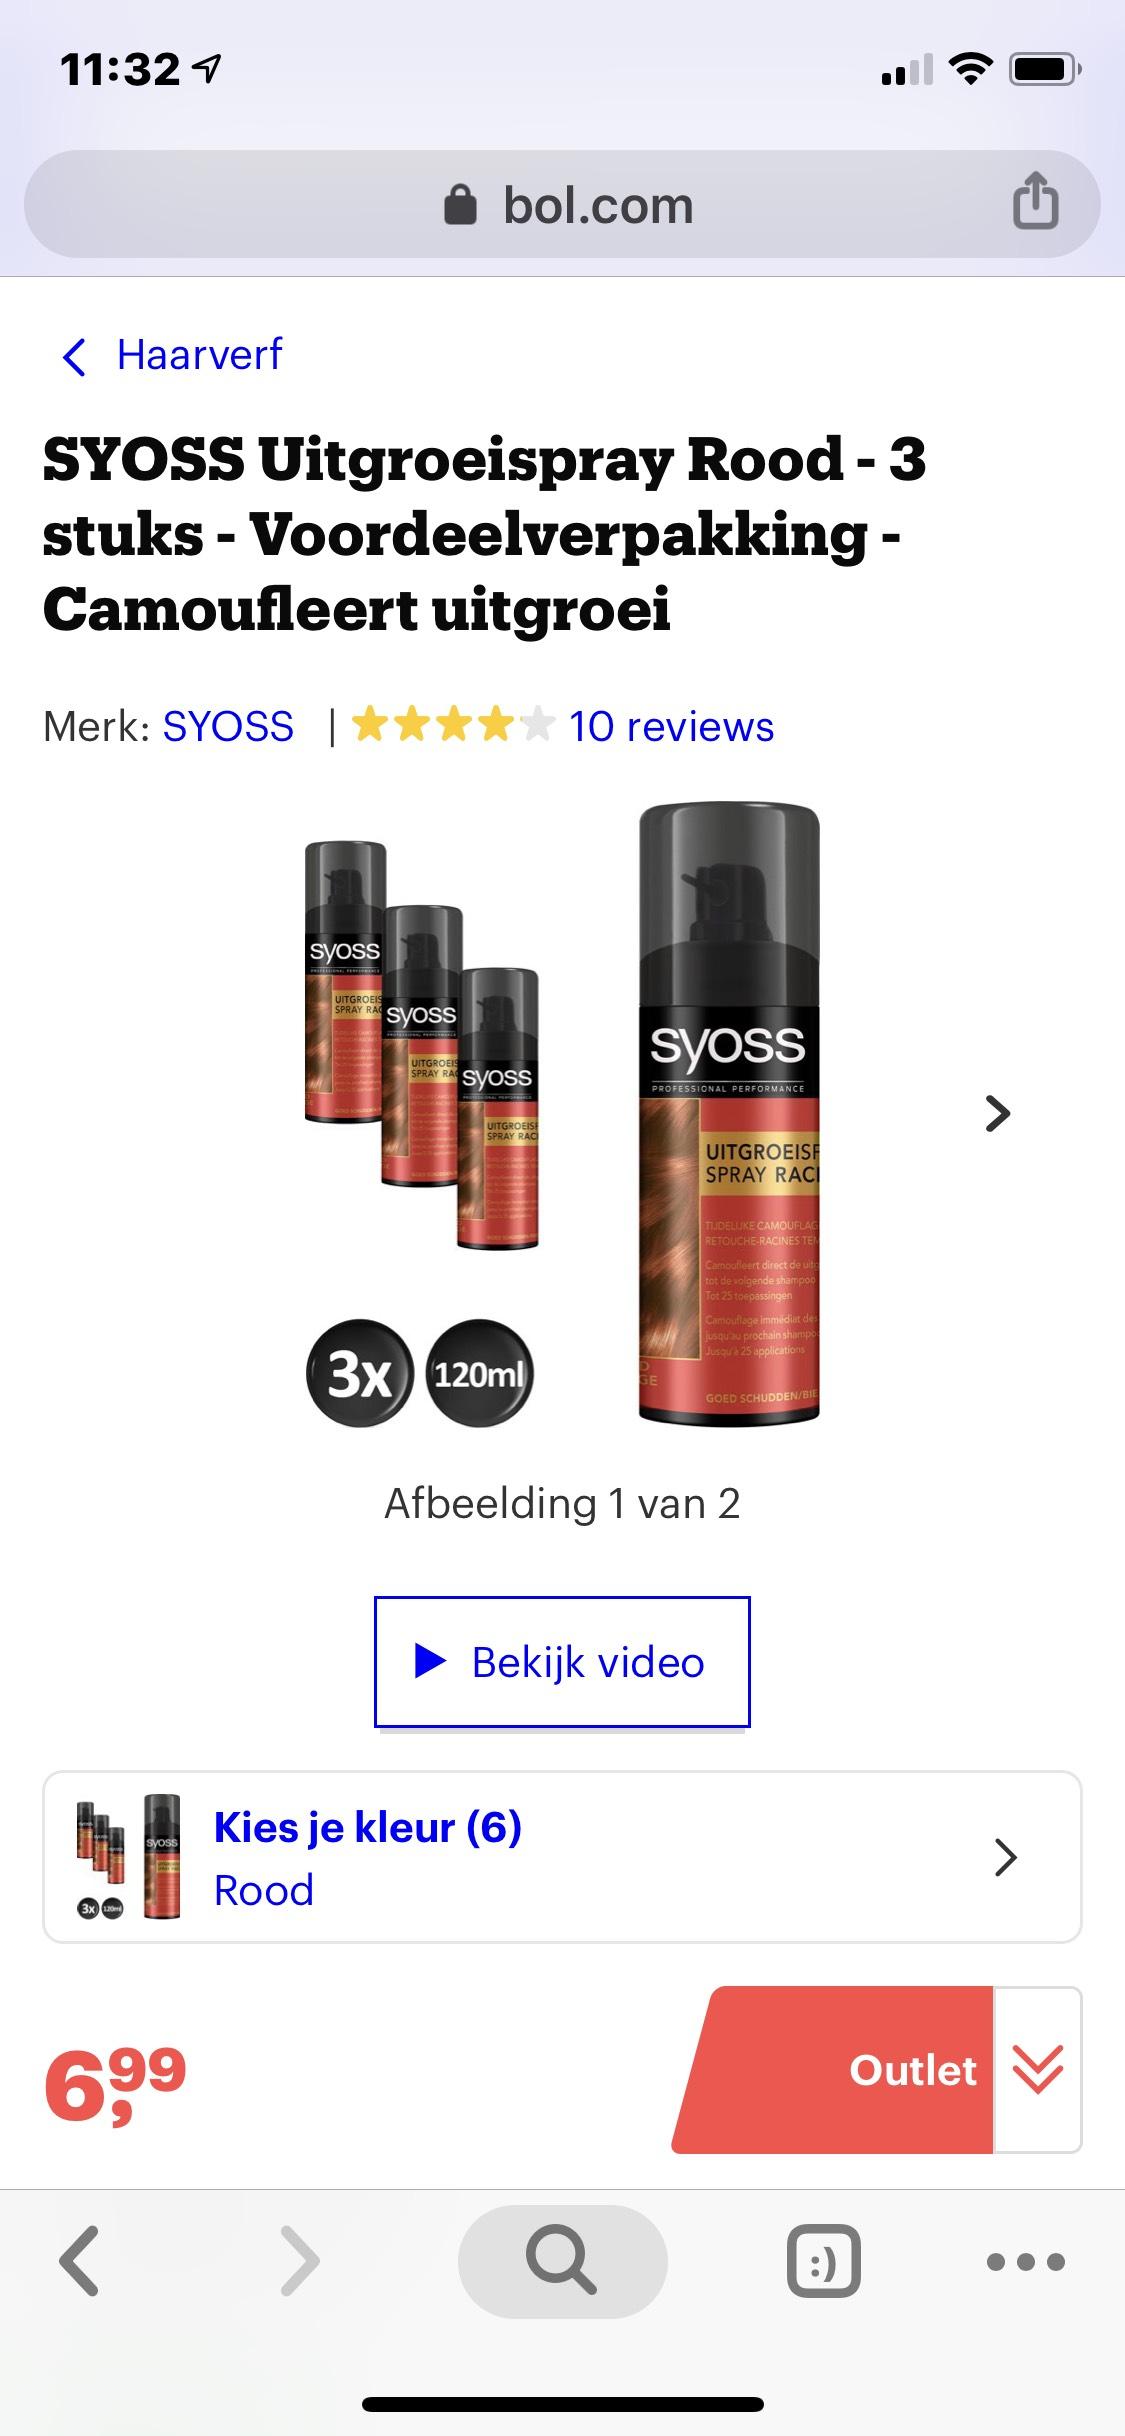 Uitgroei spray rood